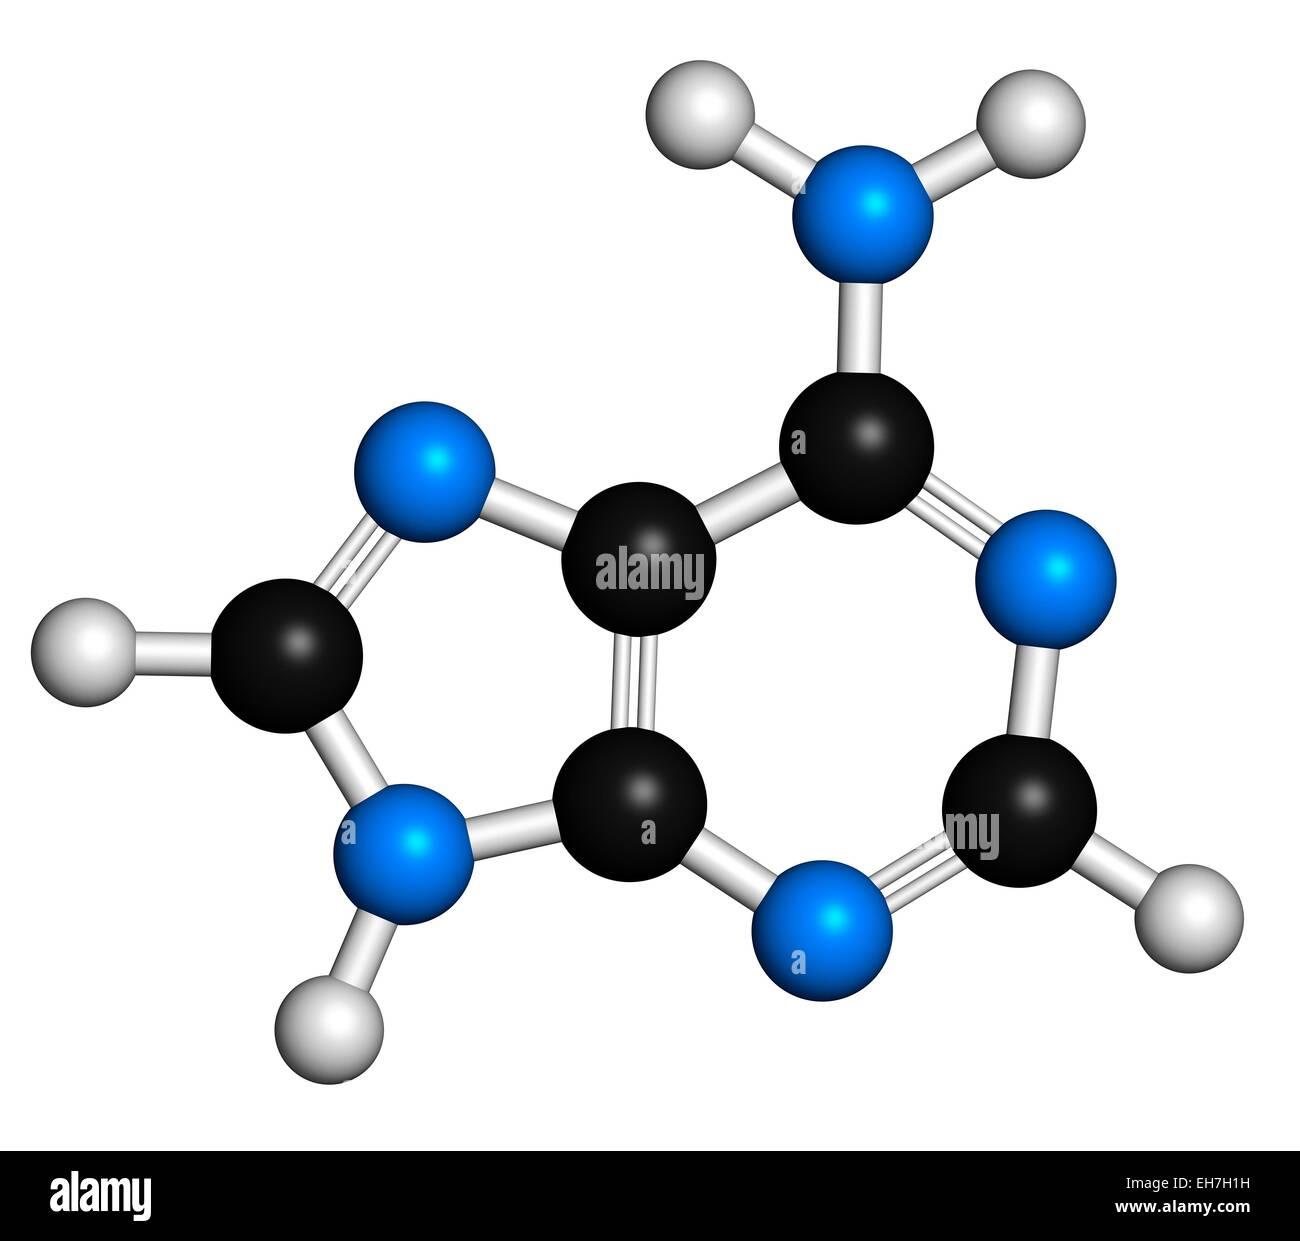 Adenine purine nucleobase molecule - Stock Image